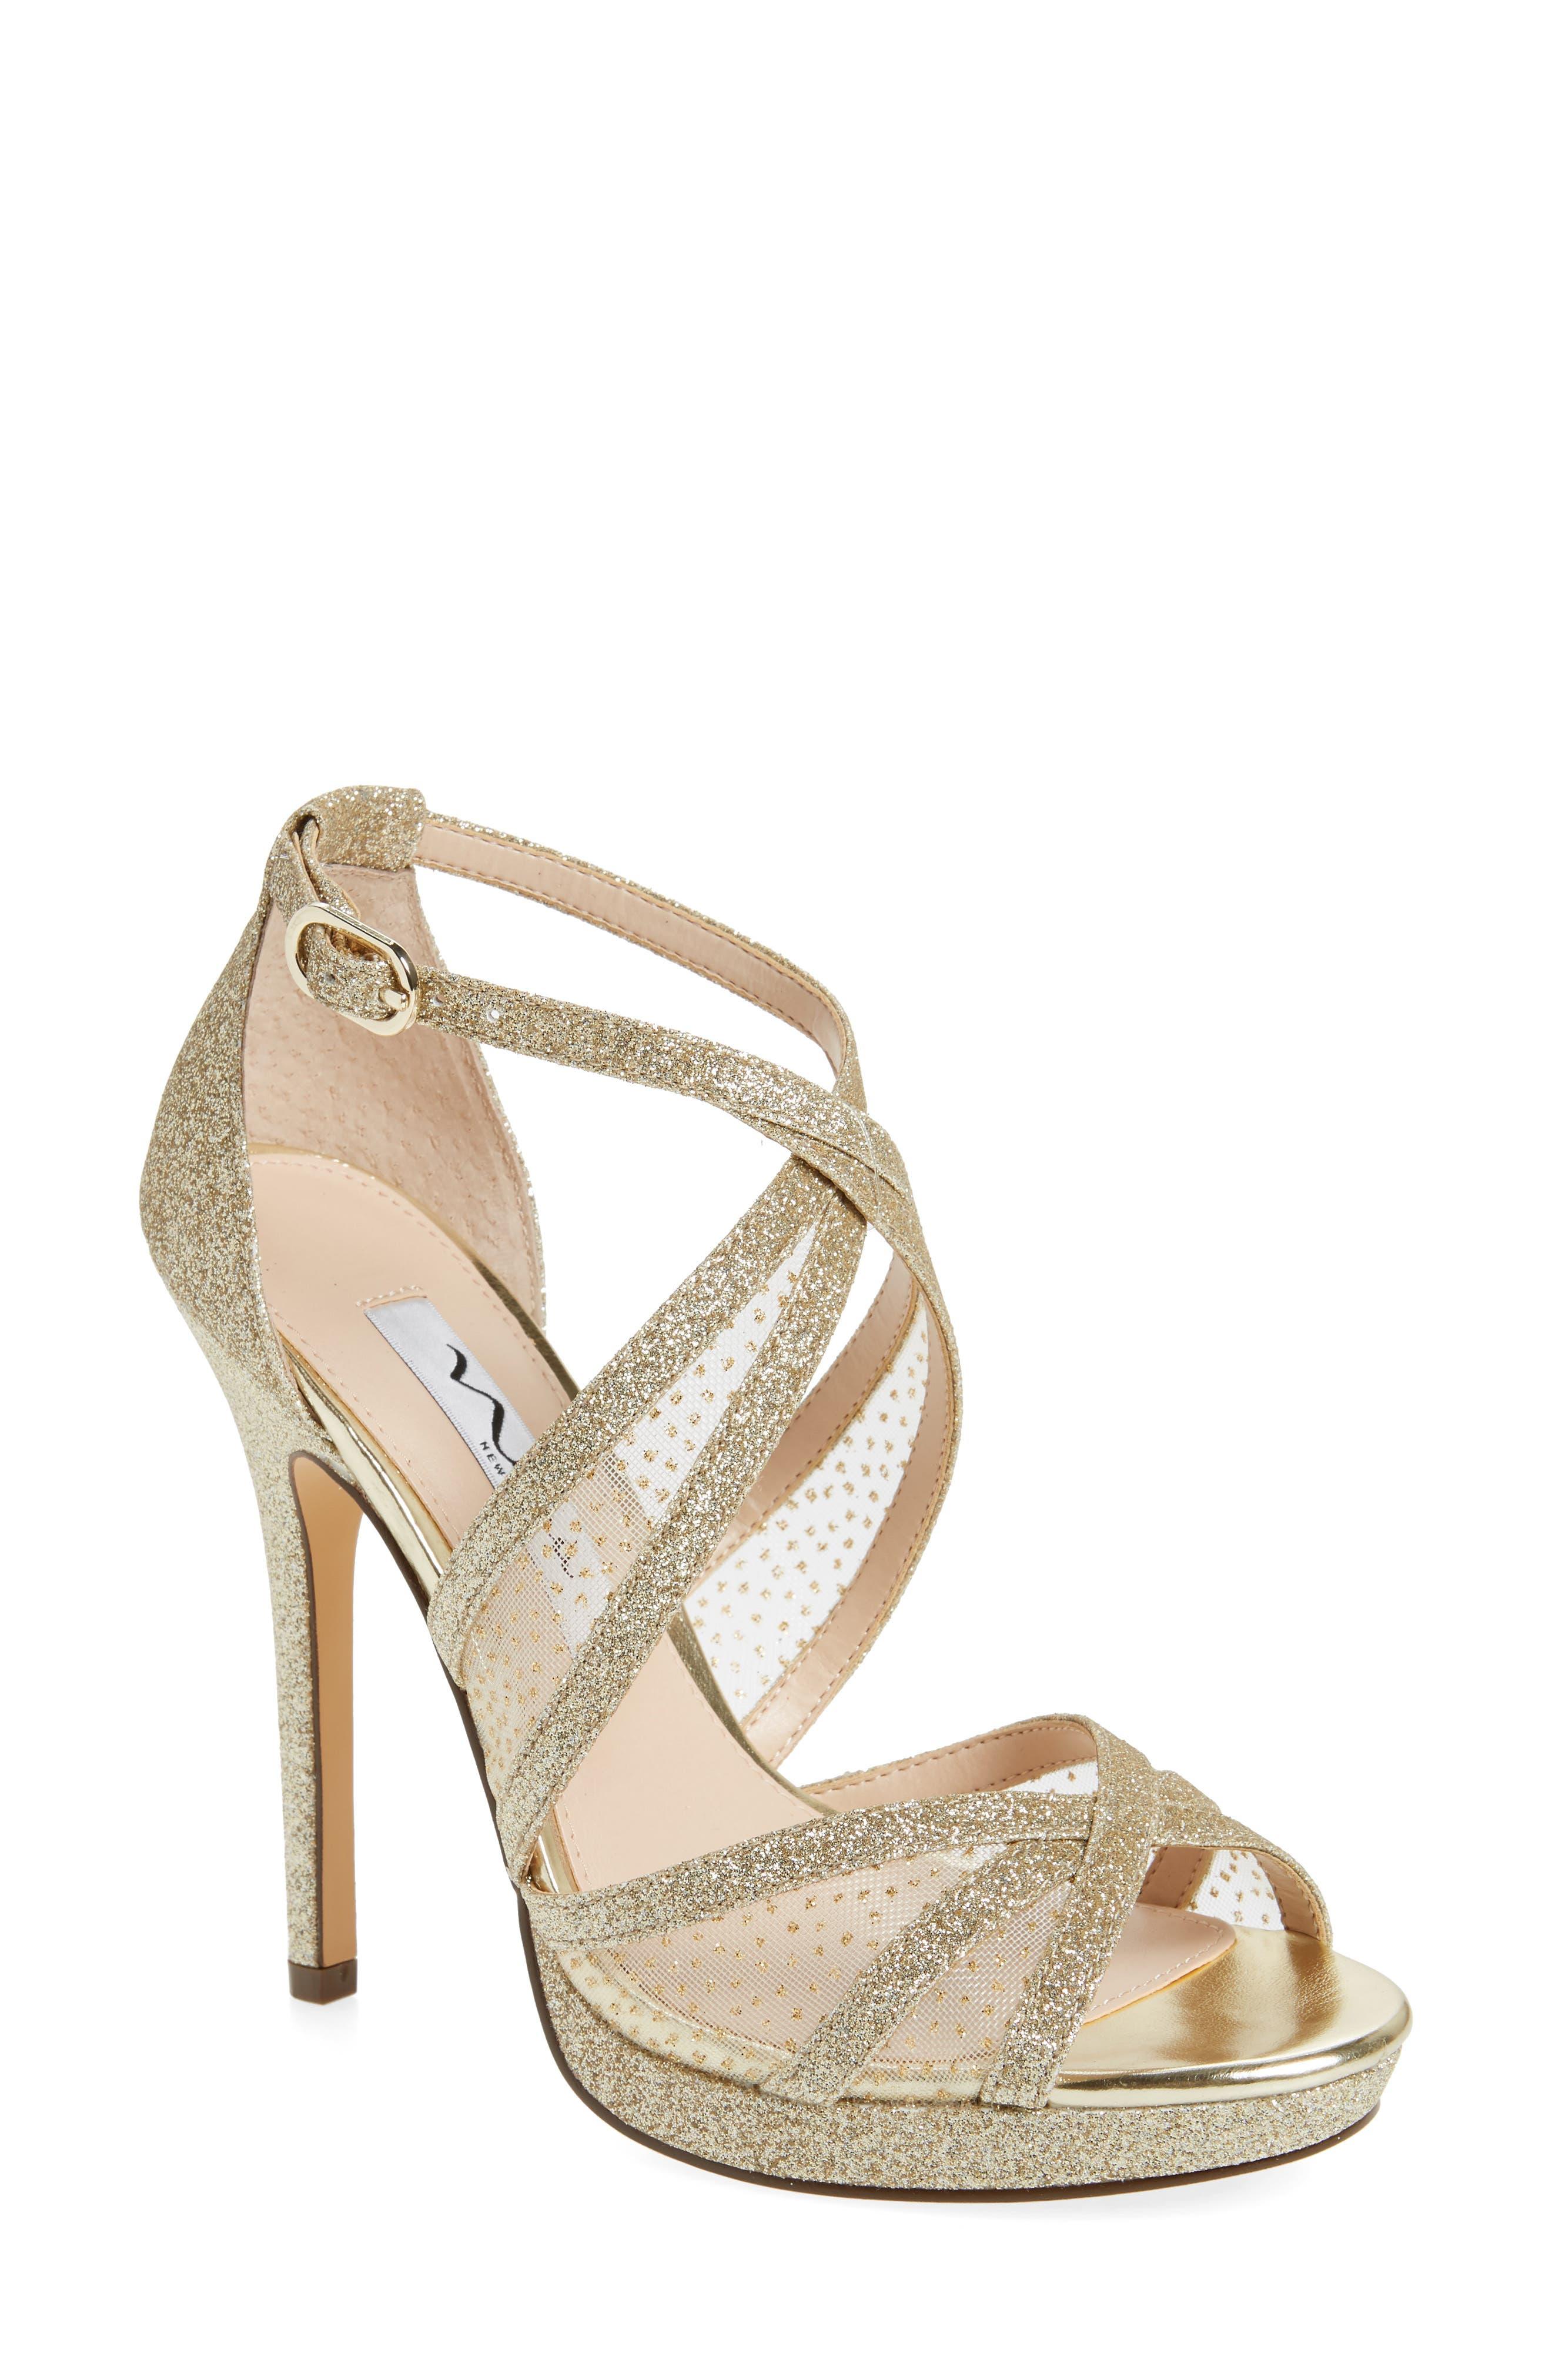 NINA Fenna Strappy Platform Sandal, Main, color, GOLD GLITTER FABRIC